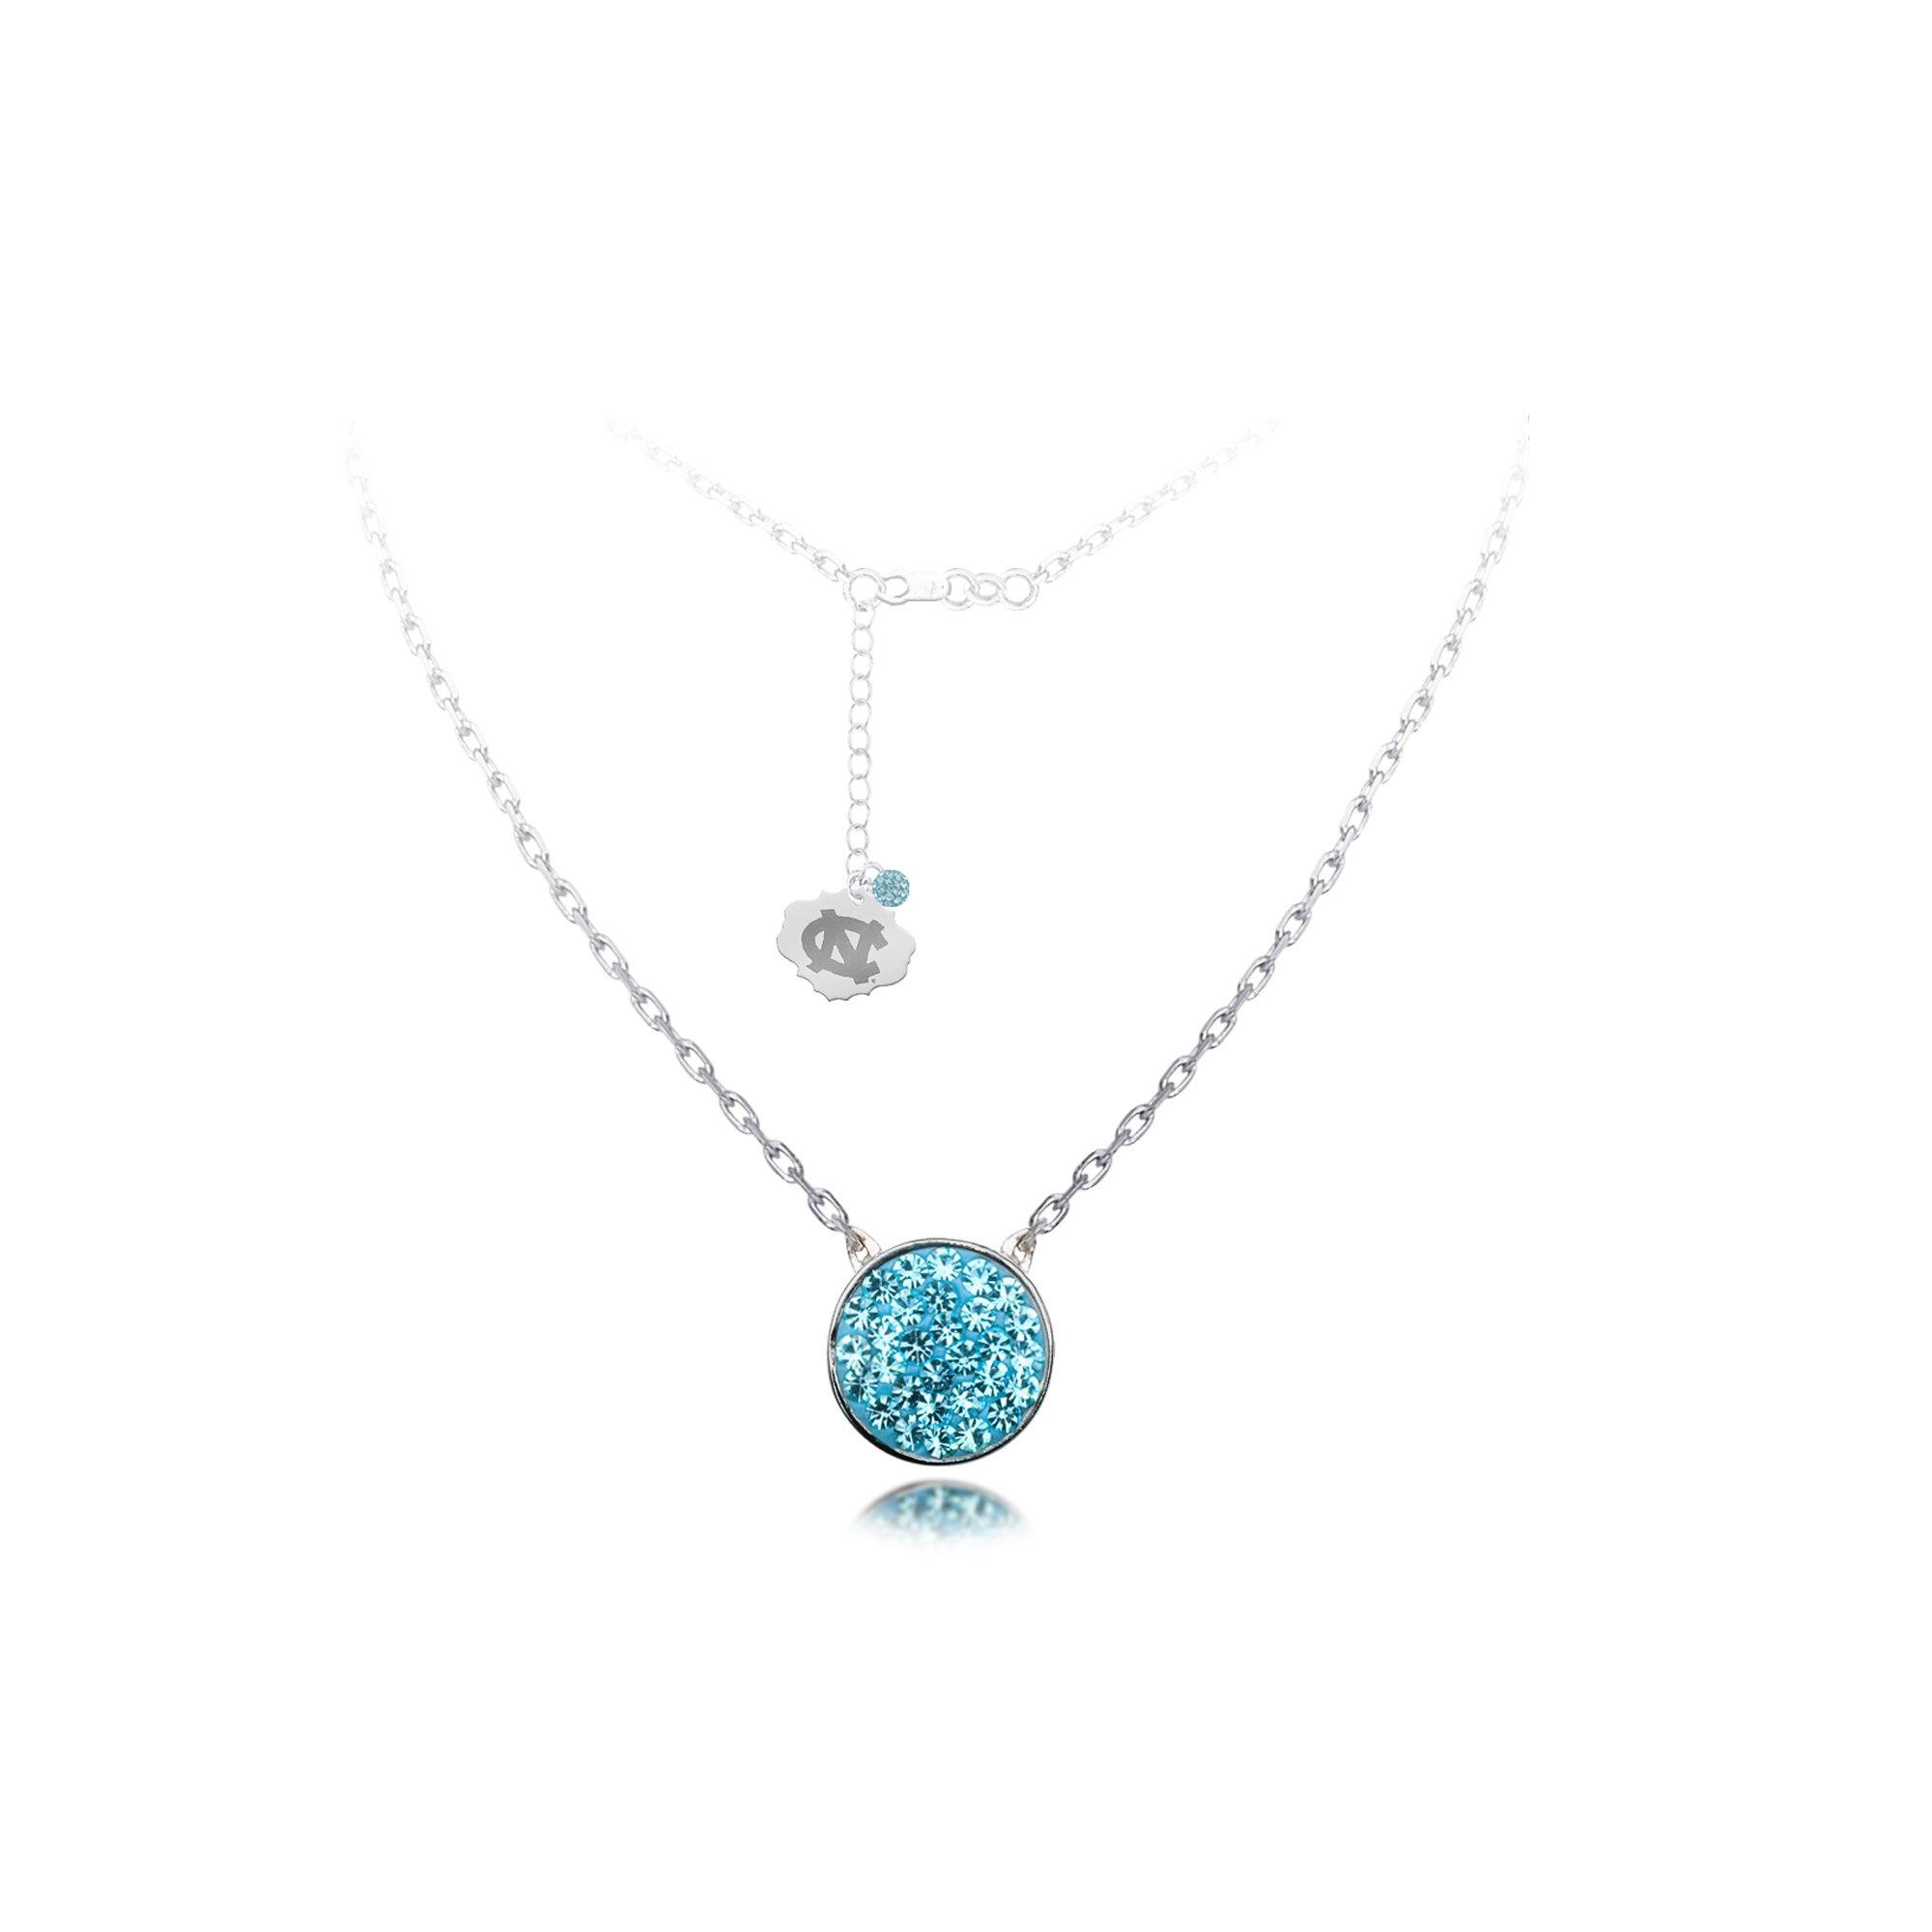 DiamondJewelryNY Silver Pendant, Spirit Disc Nk/Univ Of N Carolina